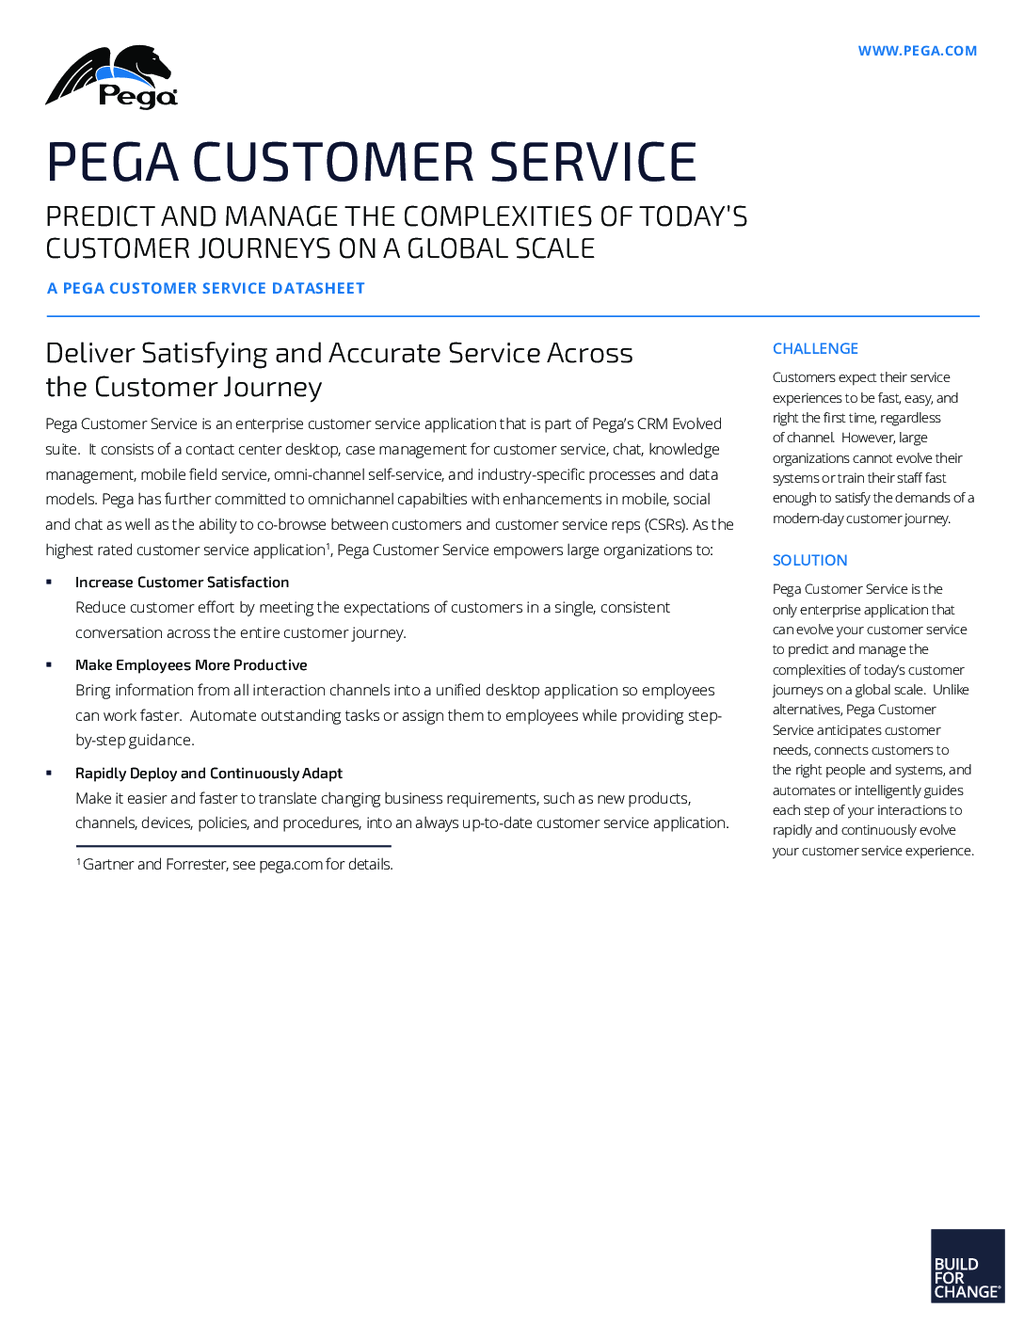 Pega Customer Service application overview | Pega